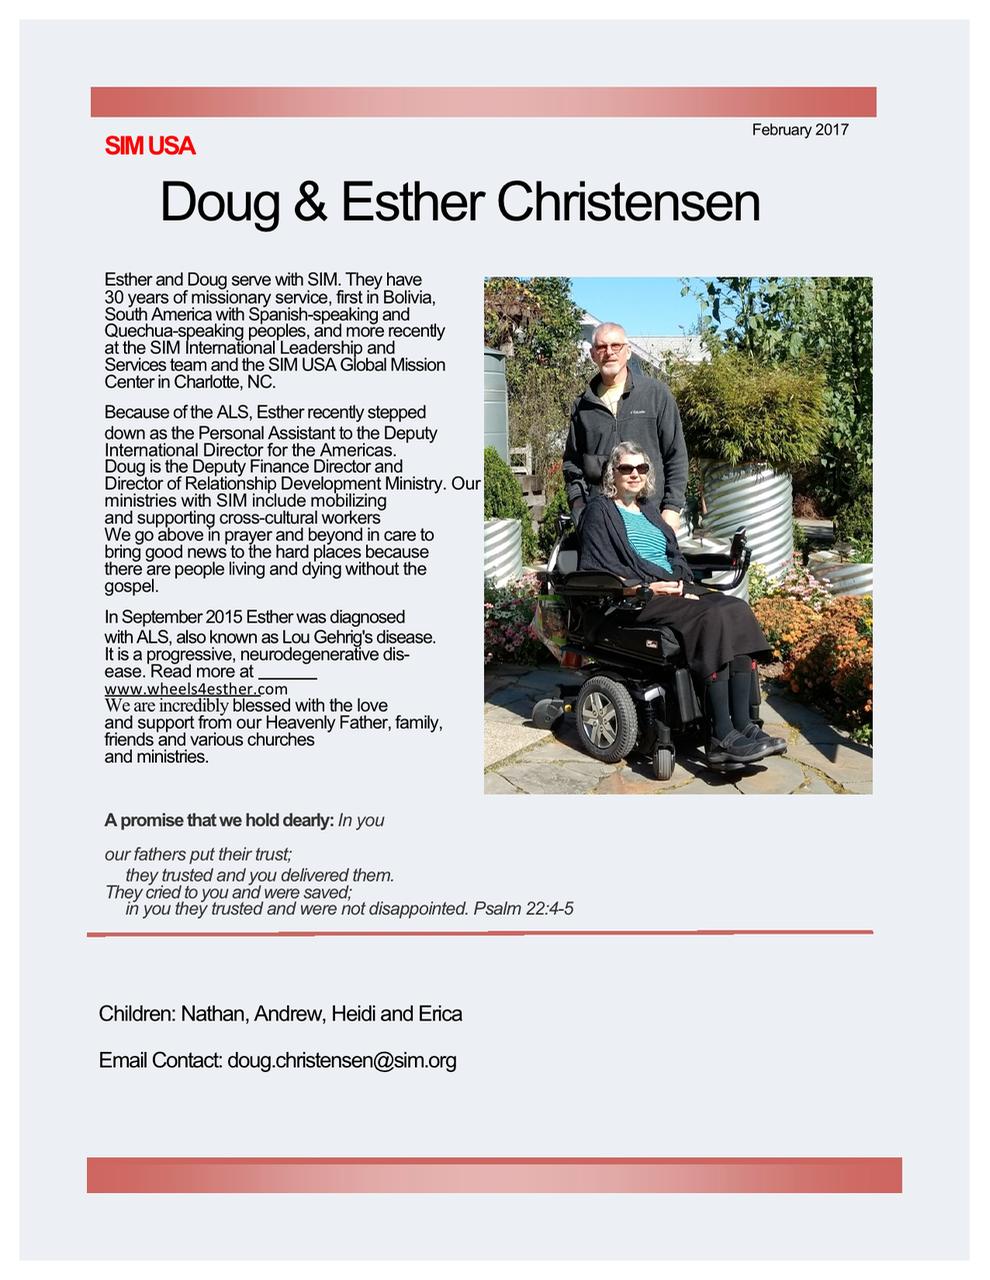 Doug and Esther Christensen